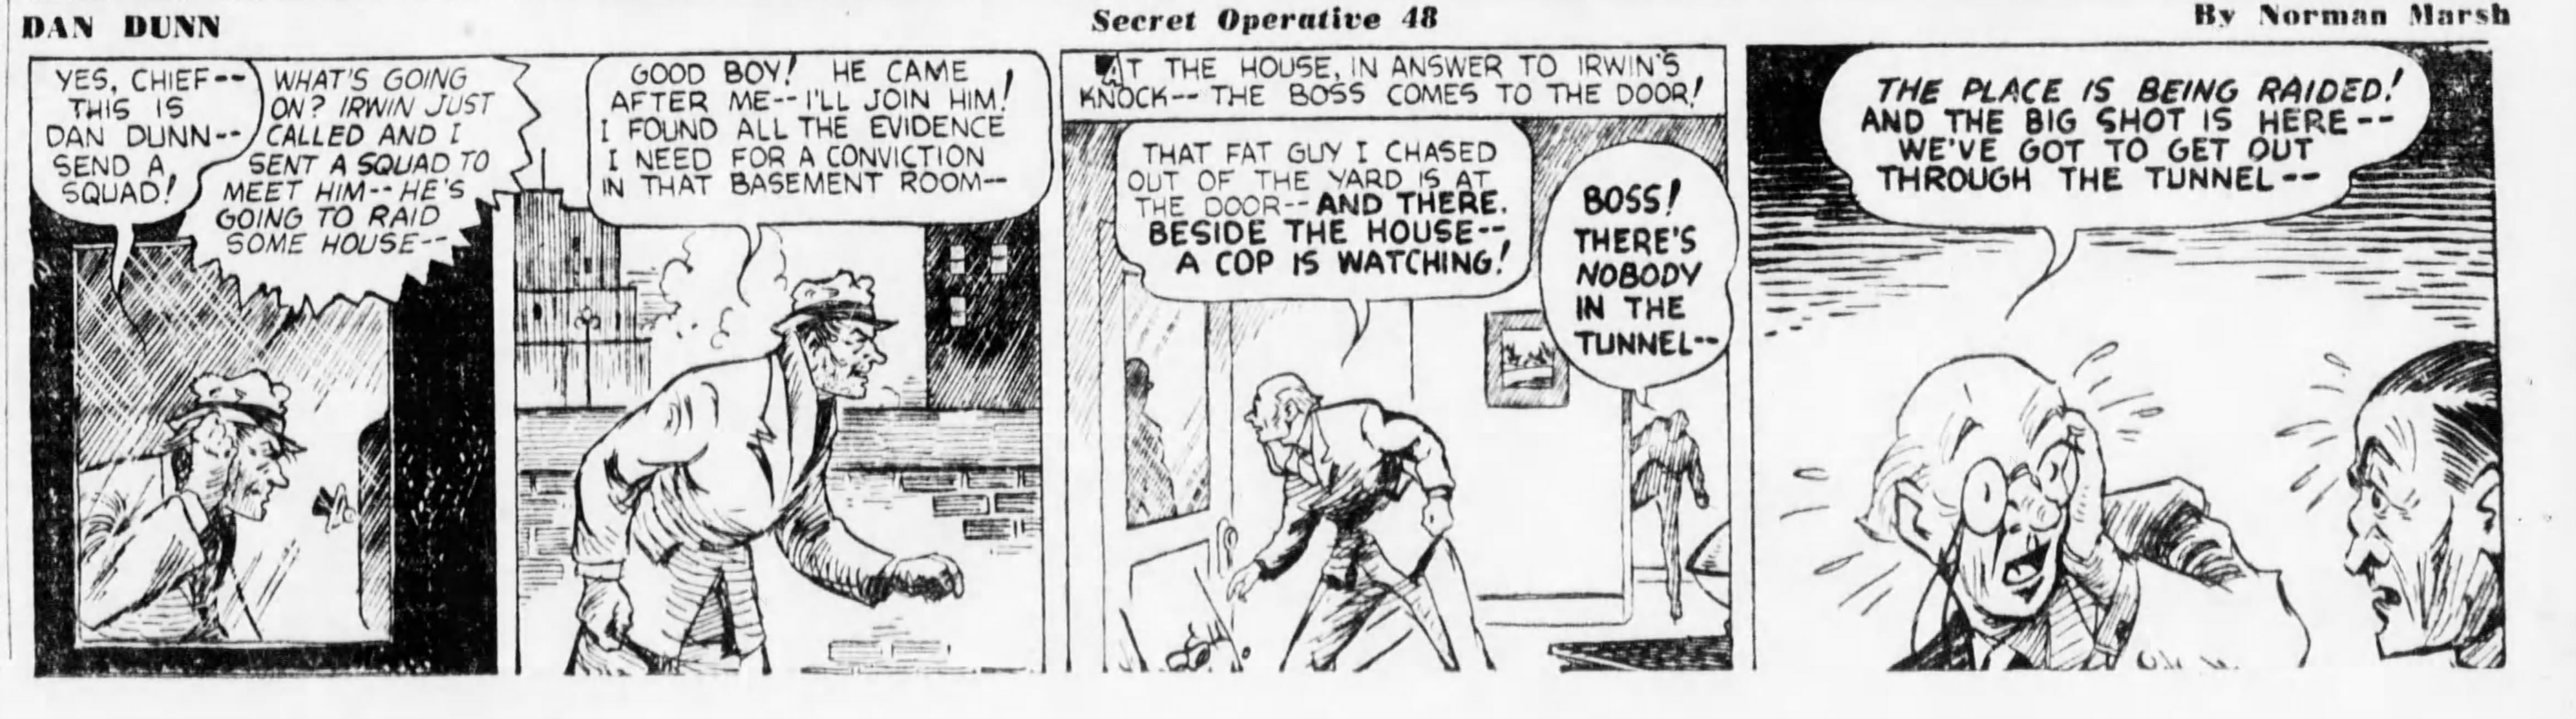 The_Brooklyn_Daily_Eagle_Thu__Feb_22__1940_-7.jpg